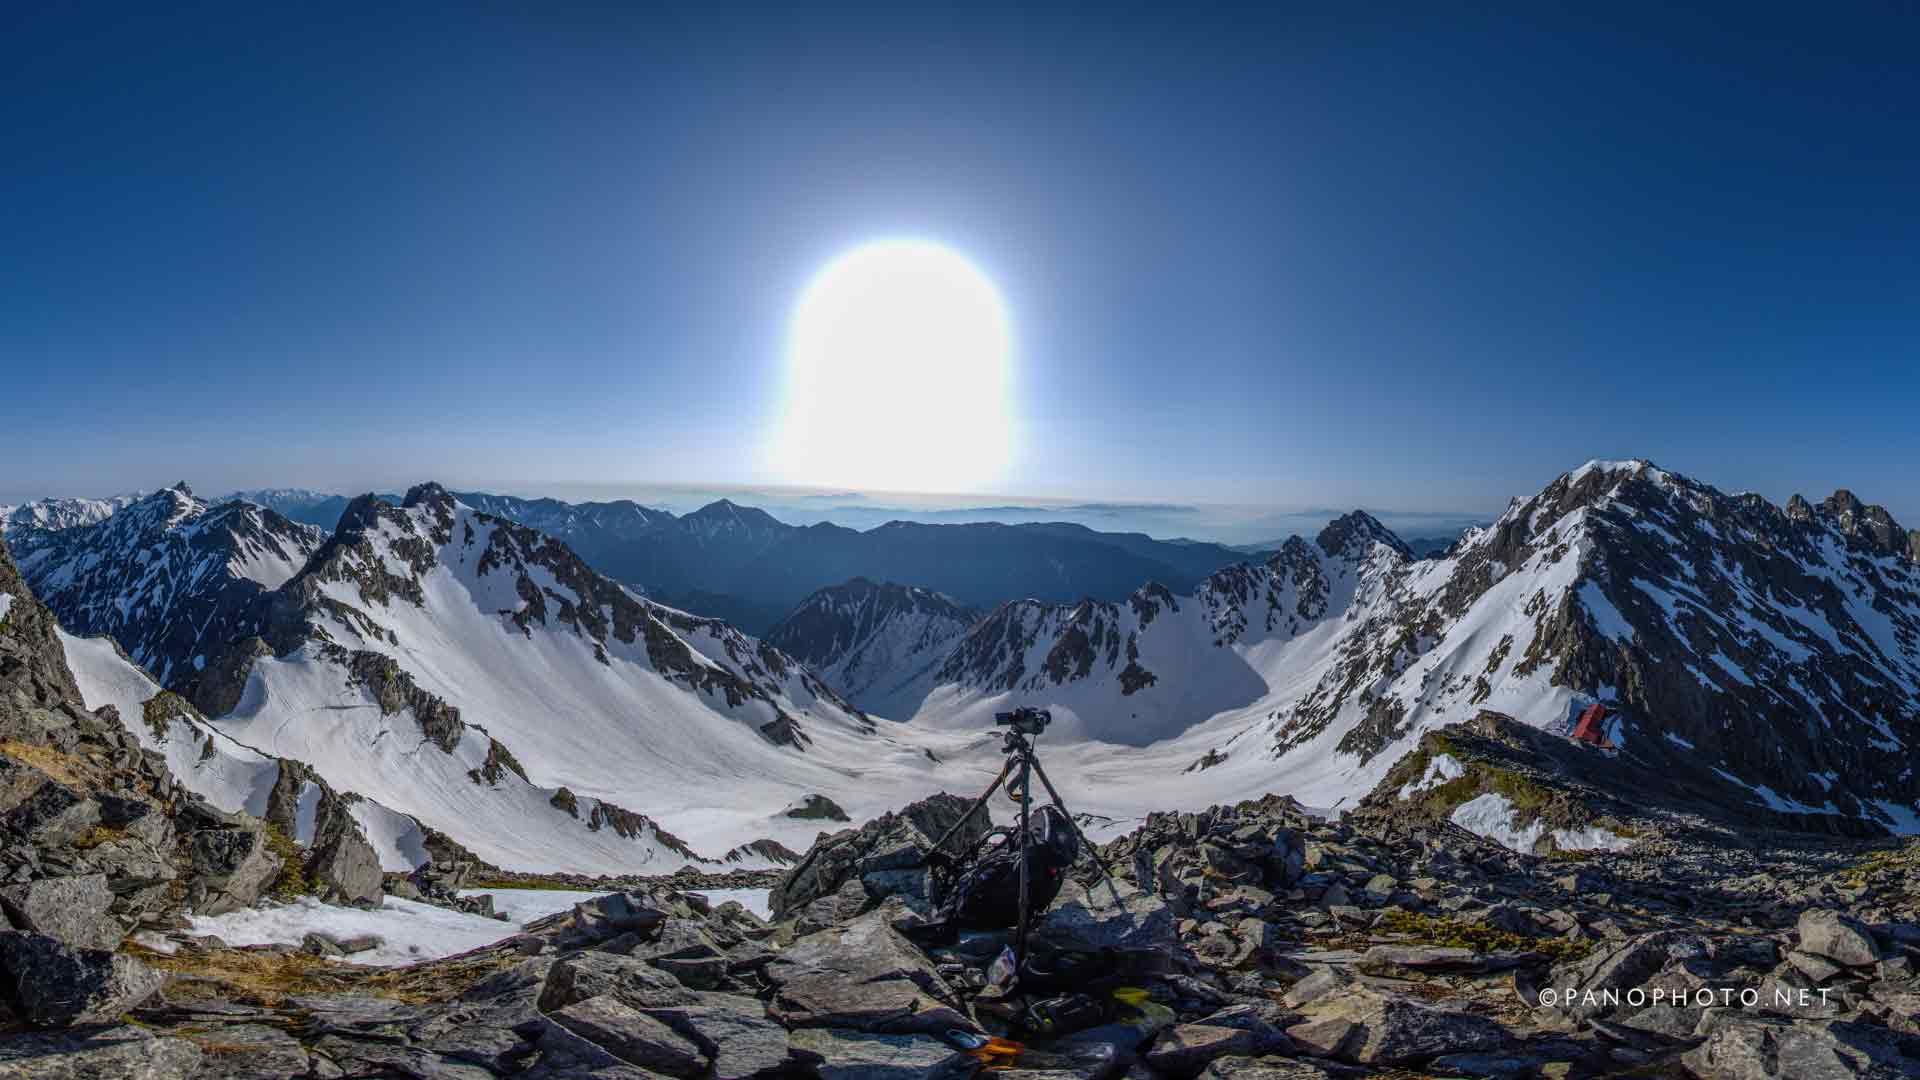 Karasawa view from Karasawadake Peak | Nikon D810 + Nikon AF Fisheye-Nikkor 16mm f/2.8D